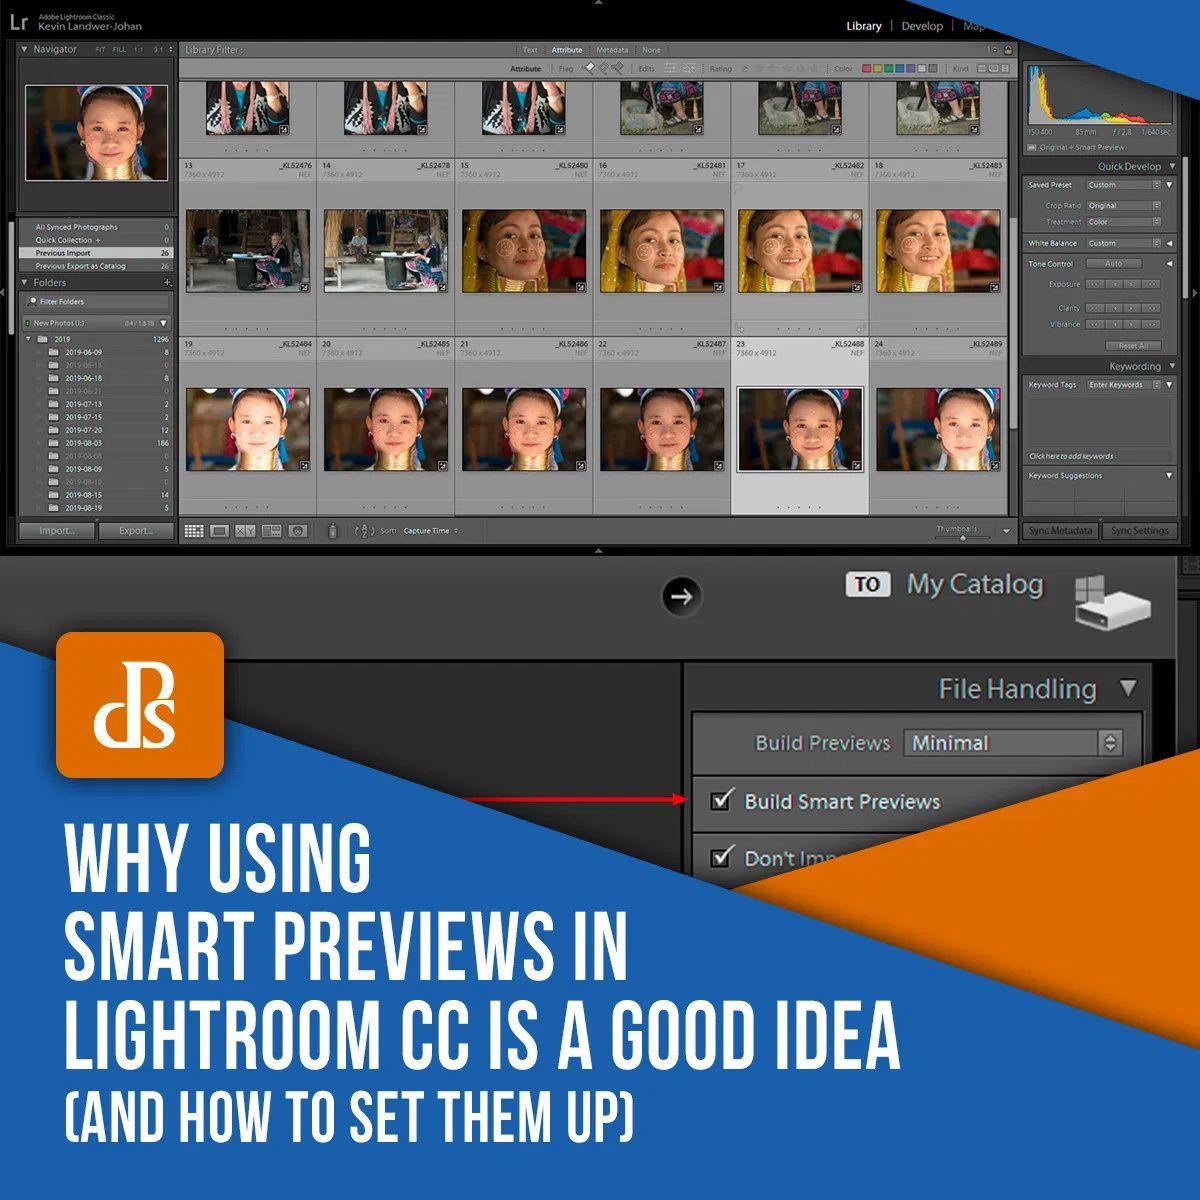 Lightroom smart previews vs standard previews